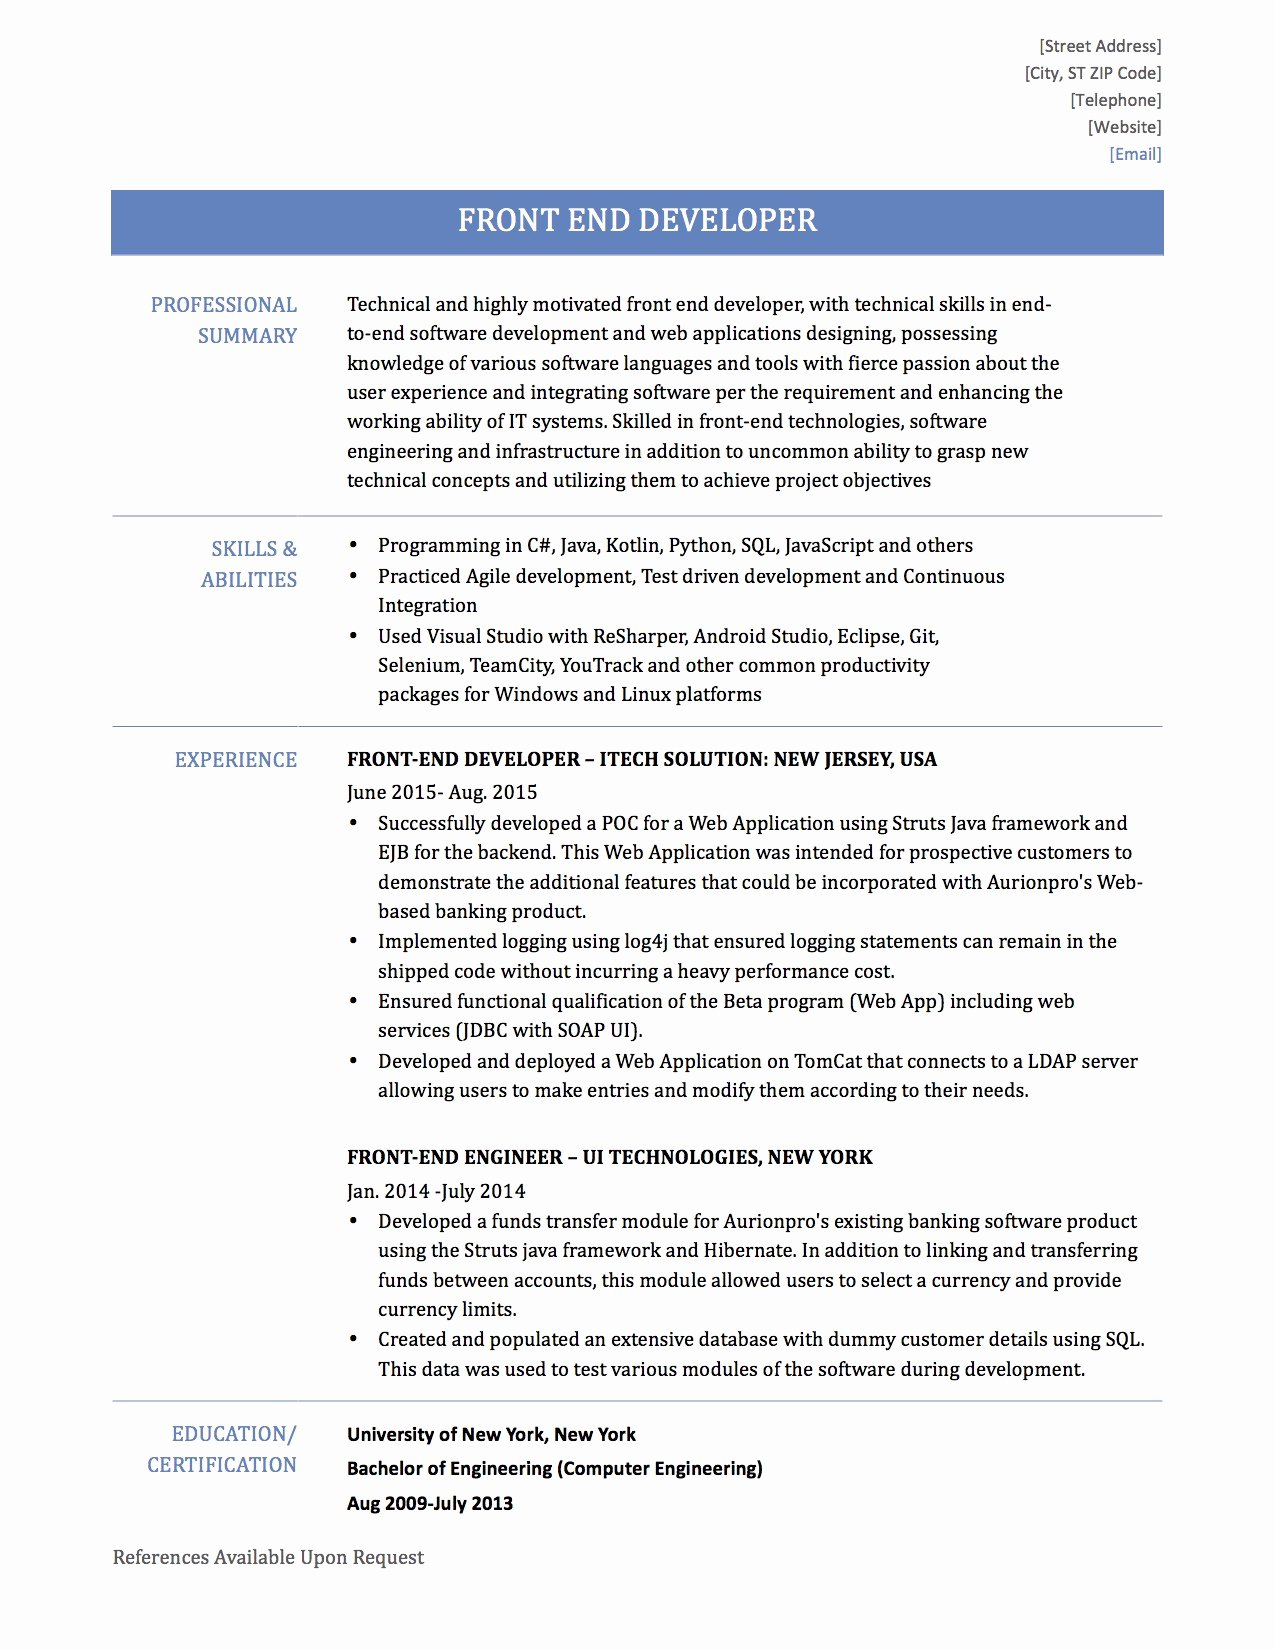 Front End Developer Resume Template Lovely How to Write A Front End Developer Resume – Line Resume